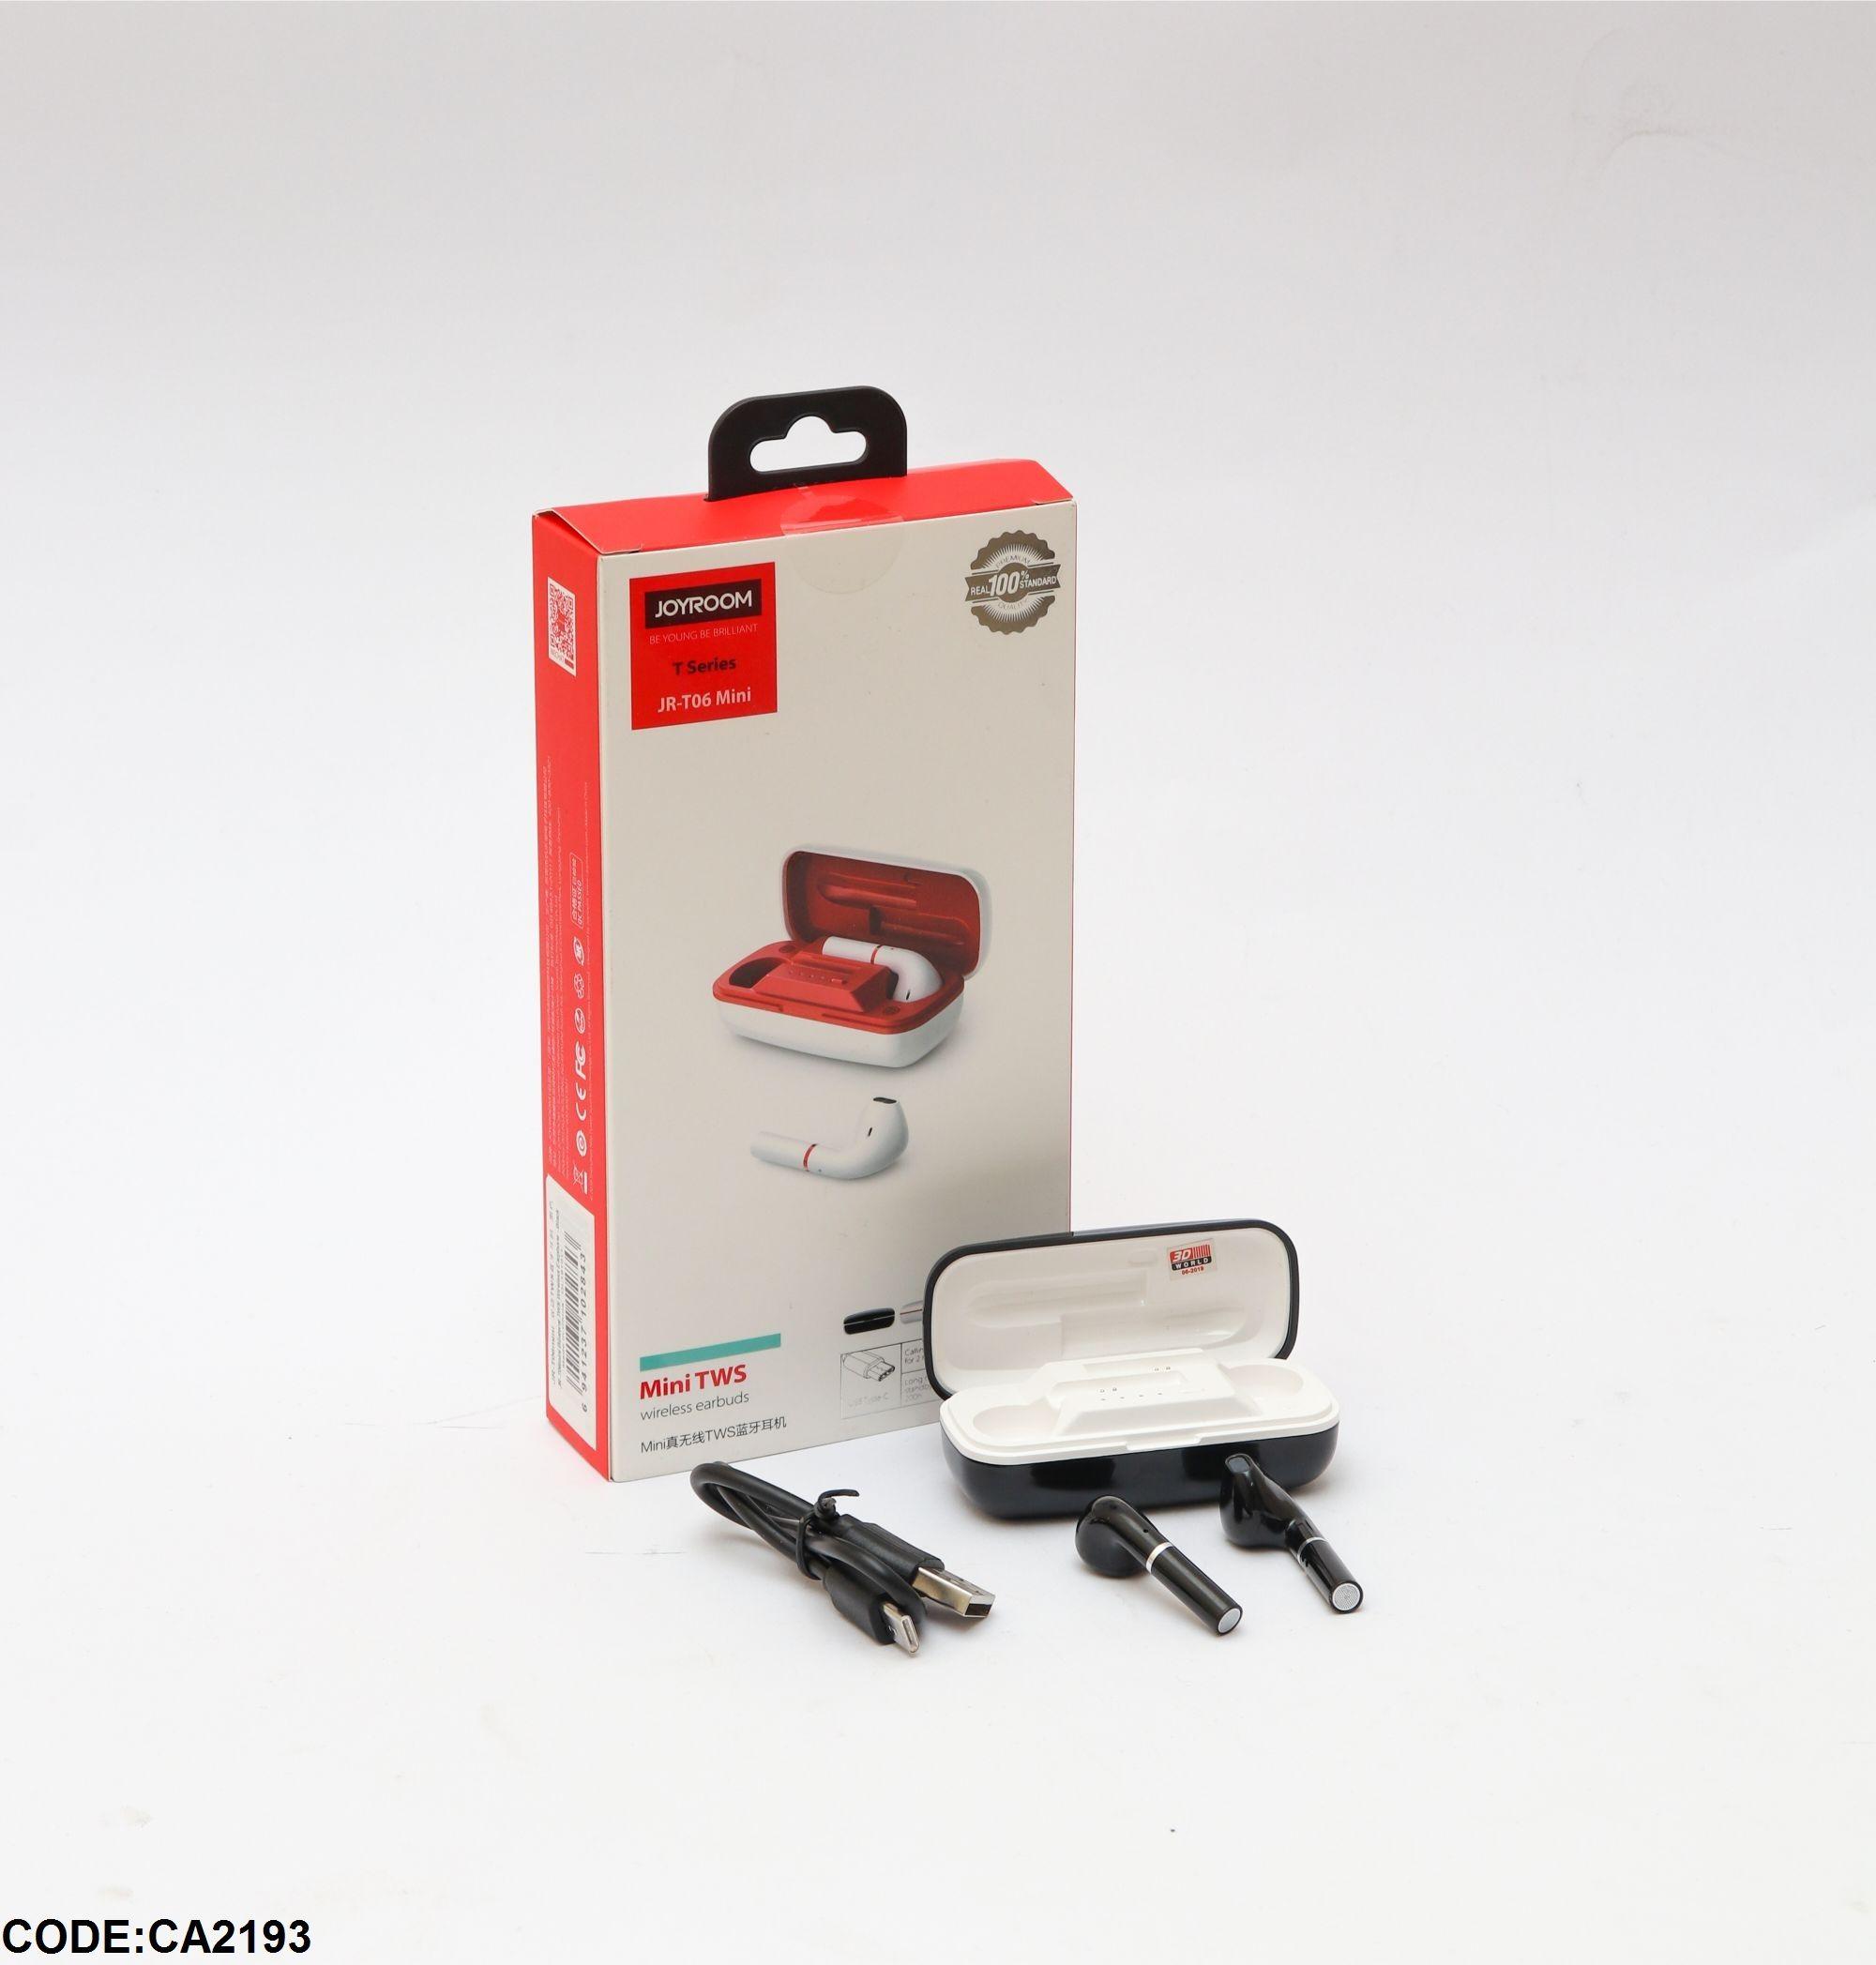 Airpods Joyroom Pro Original بسعر 620ج بدل من 760ج Phone Accessories Phone Accessories